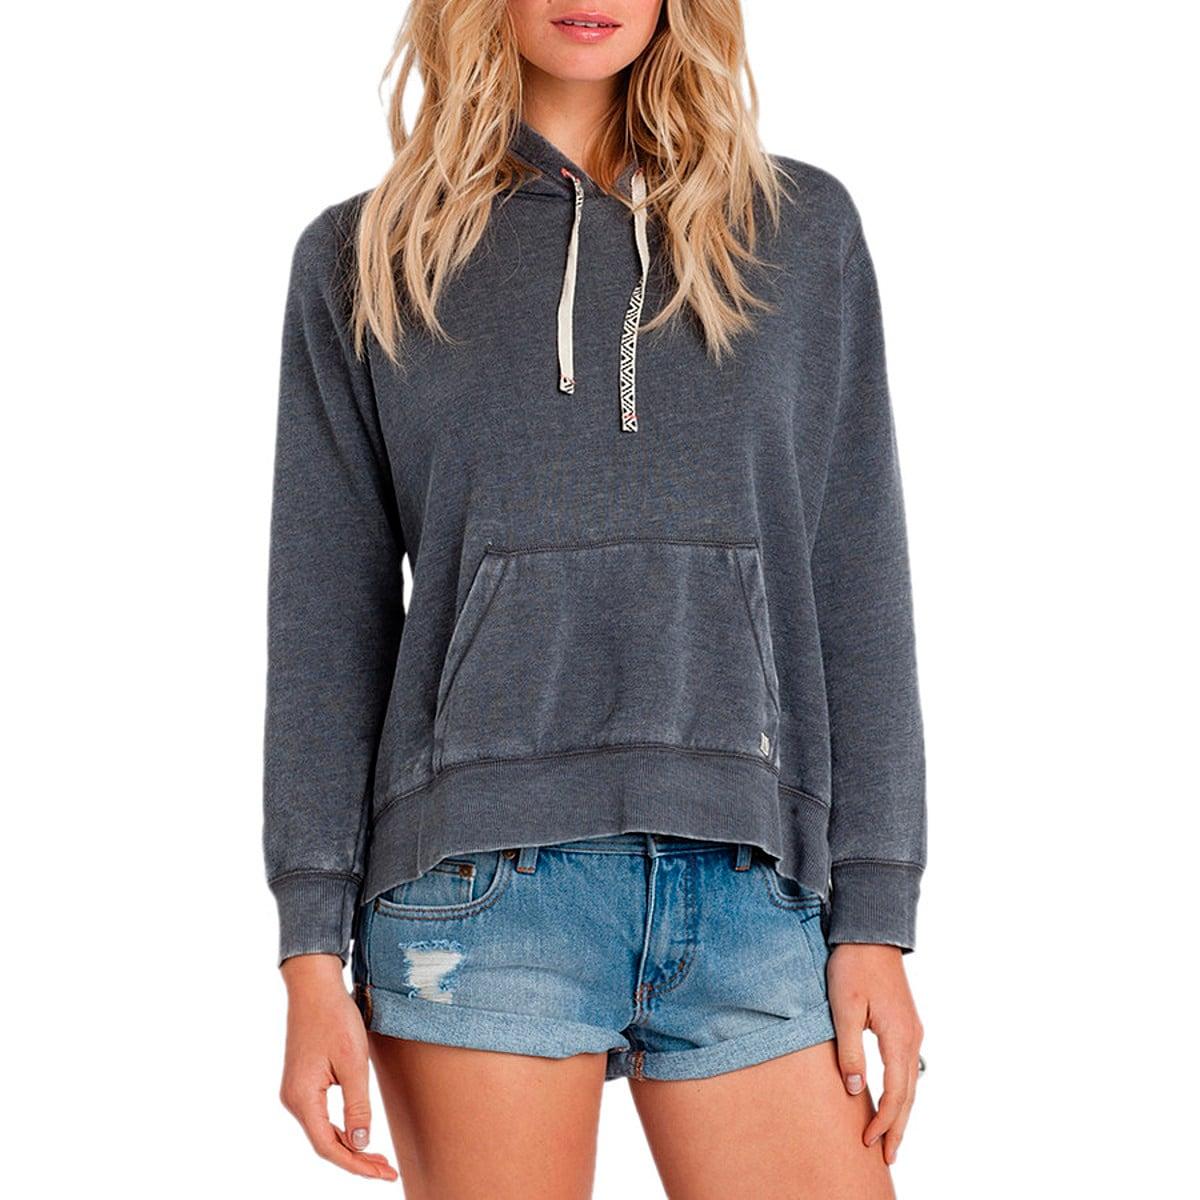 Billabong pullover hoodie